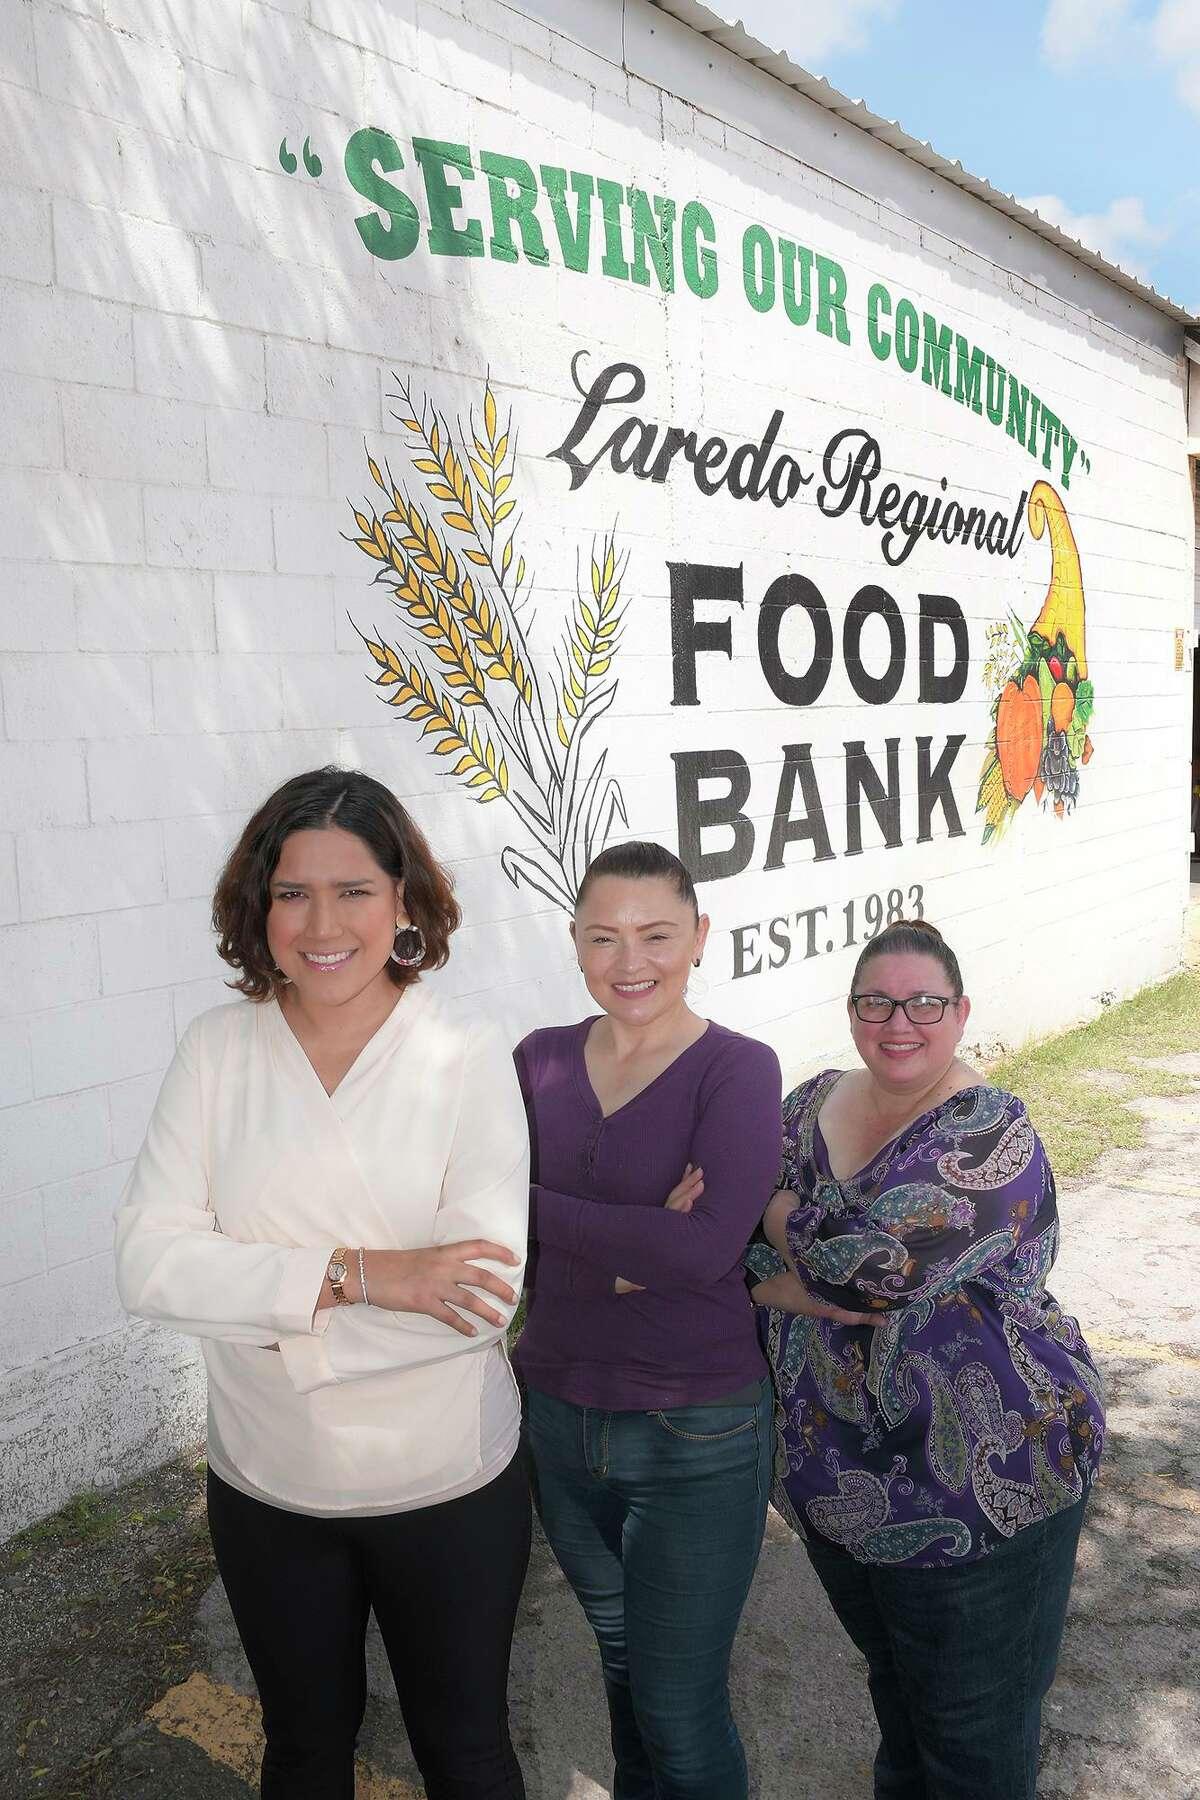 Laredo Regional Food Bank Executive Director, Carmen Garcia-Arévalo, directora de Laredo Regional Food Bank, junto a .